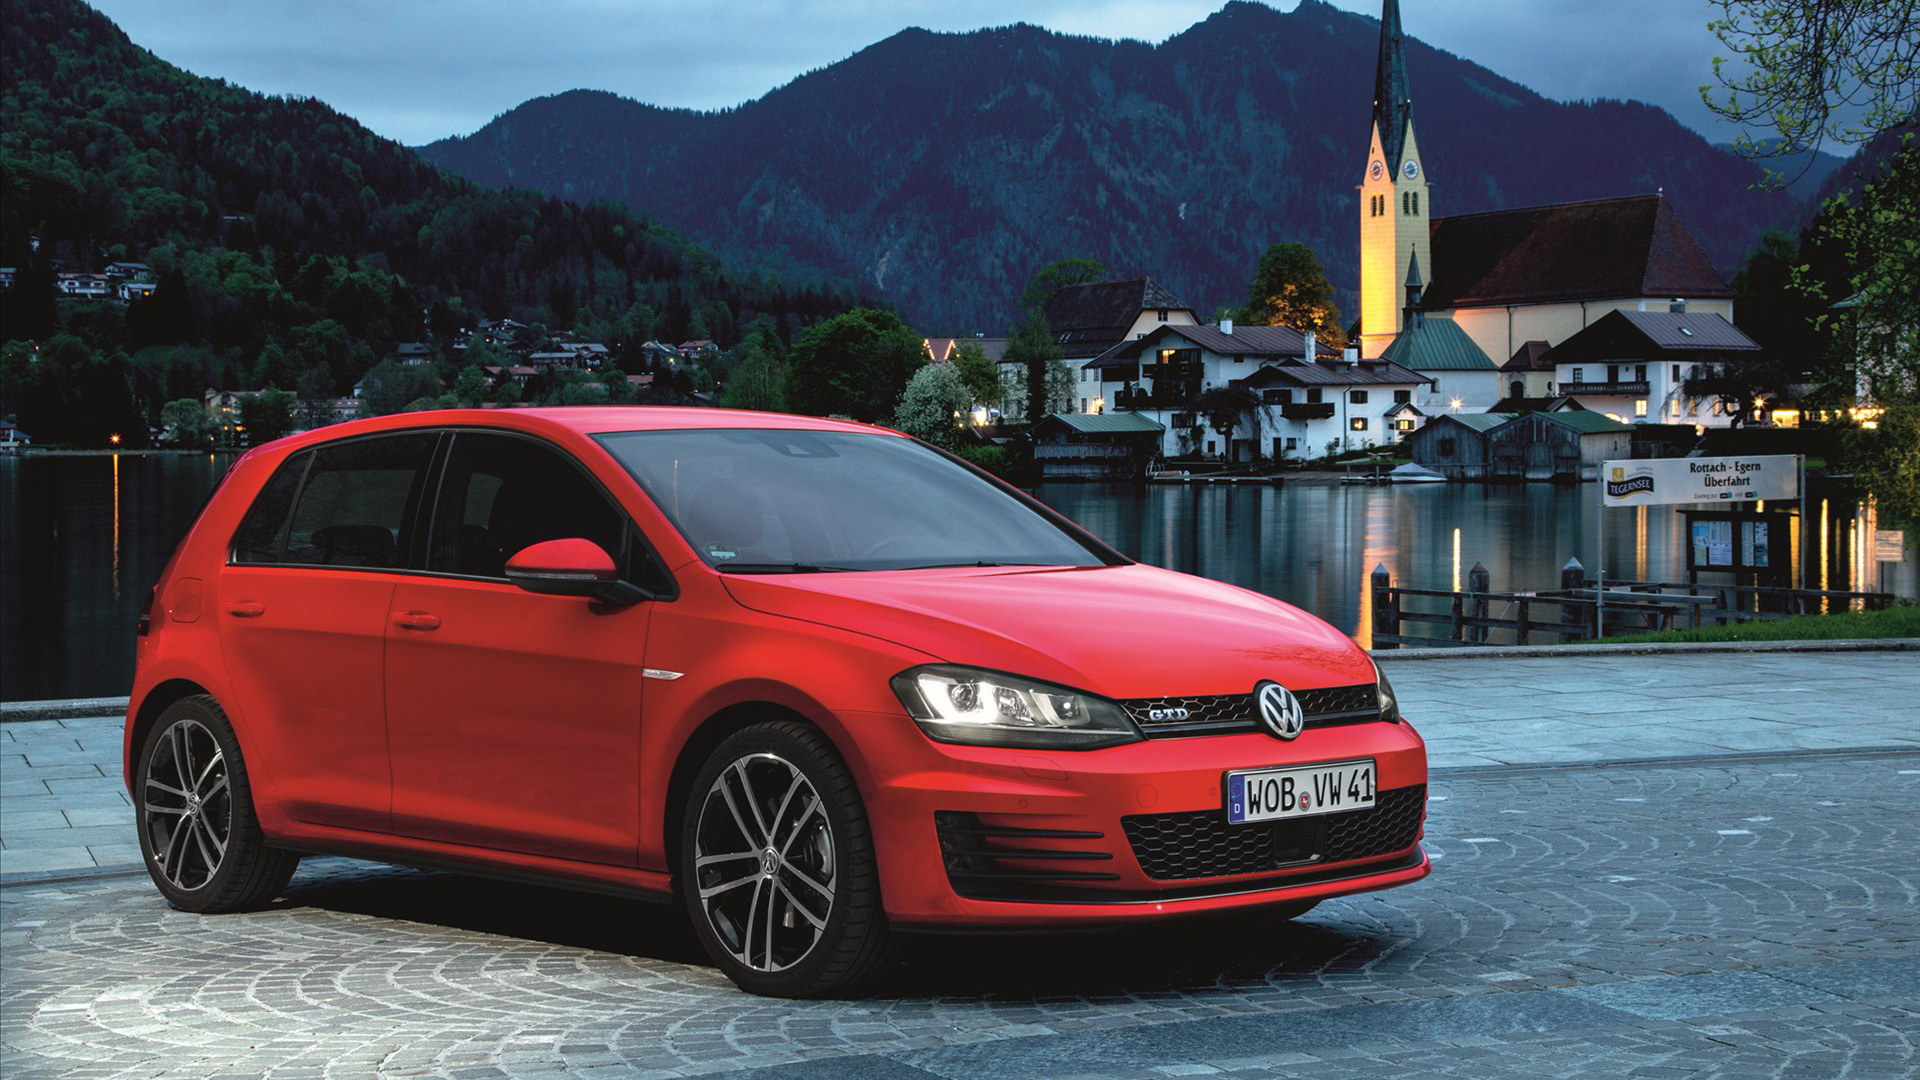 2014 volkswagen golf gtd wallpaper hd car wallpapers id 3466. Black Bedroom Furniture Sets. Home Design Ideas